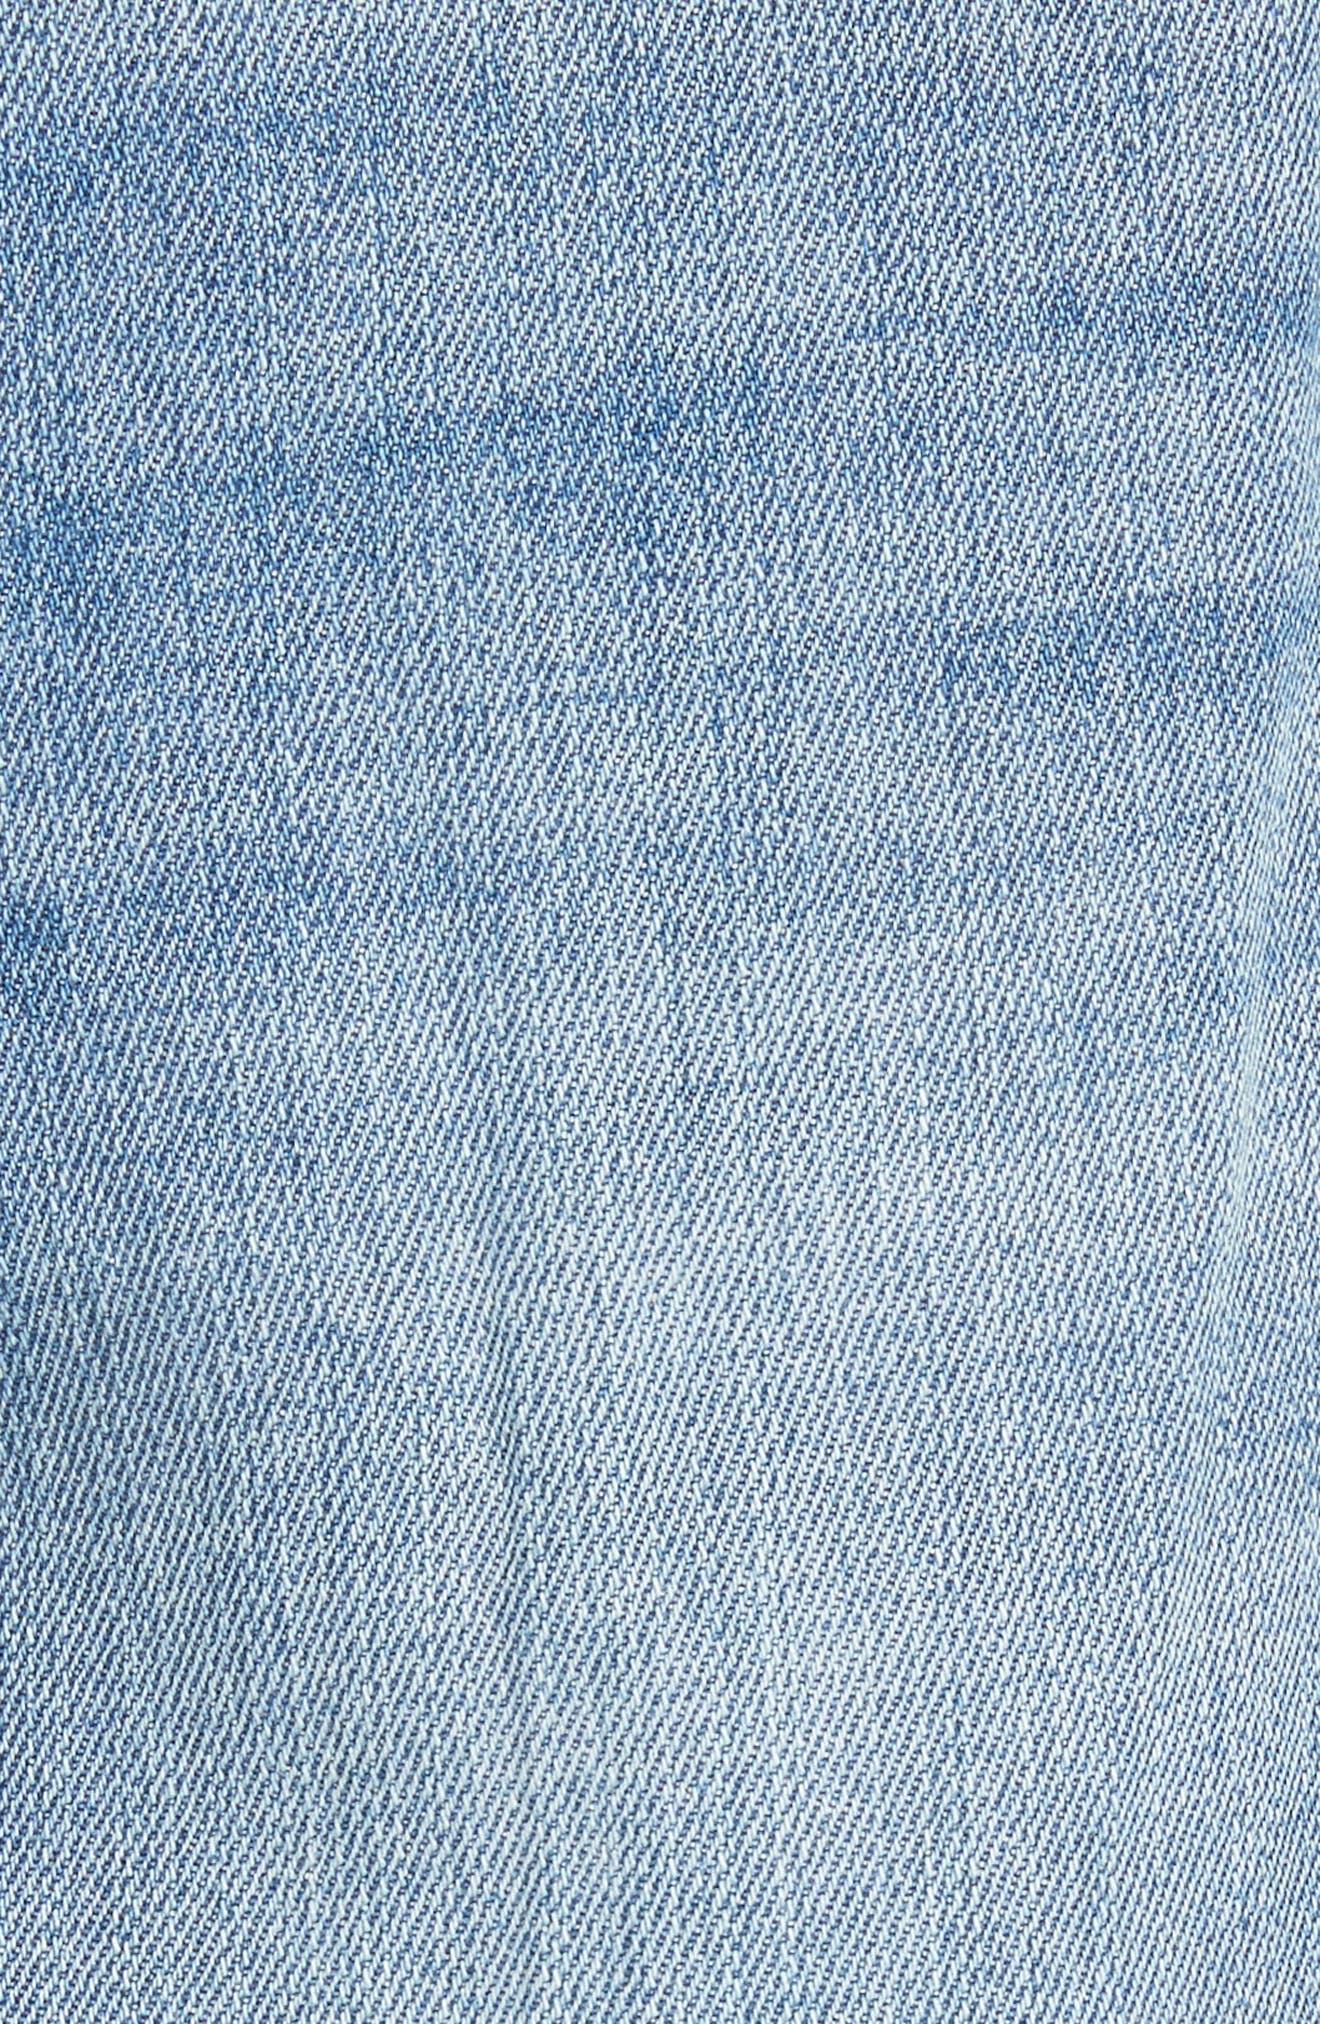 Alternate Image 5  - Tory Burch Betsy Straight Leg Jeans (Dusk Blue)